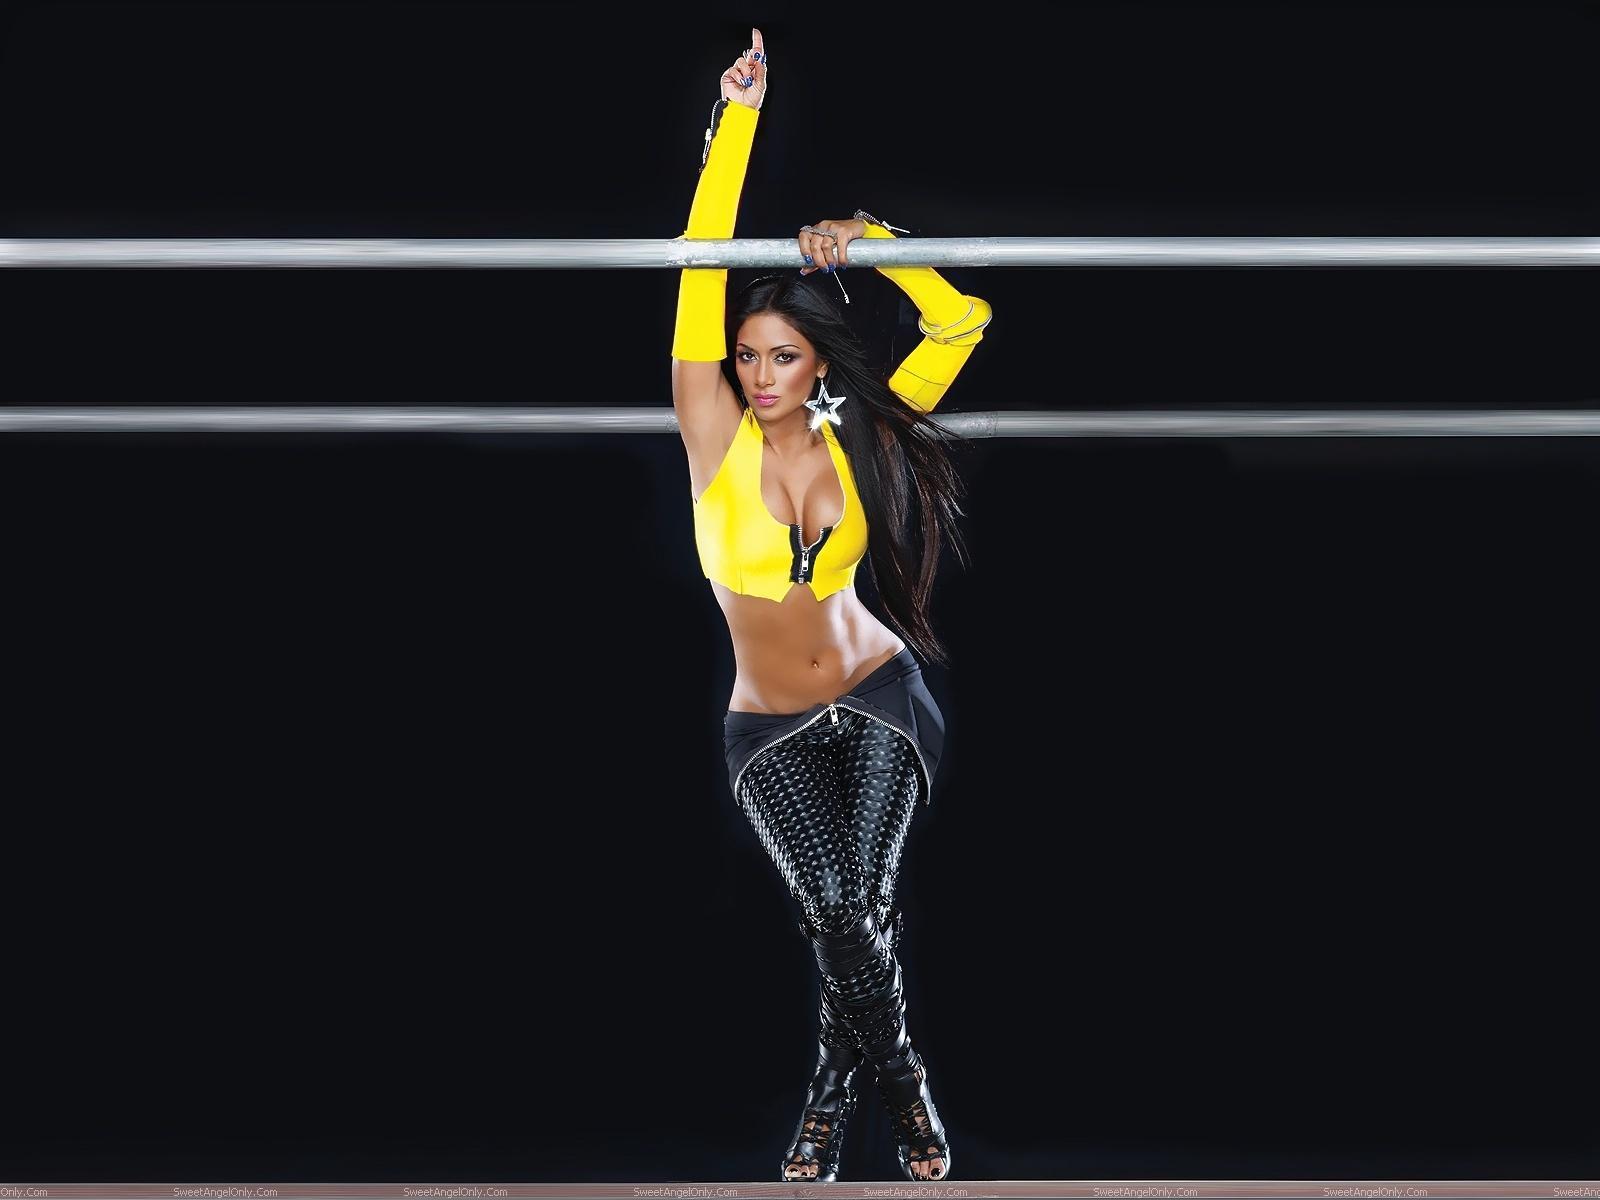 http://4.bp.blogspot.com/-JXmvuN1_Ozc/TaL8vZ4S2II/AAAAAAAAGRc/8ub4ZqJj-WI/s1600/nicole_scherzinger_hot_wallpaper_in_yellow.jpg